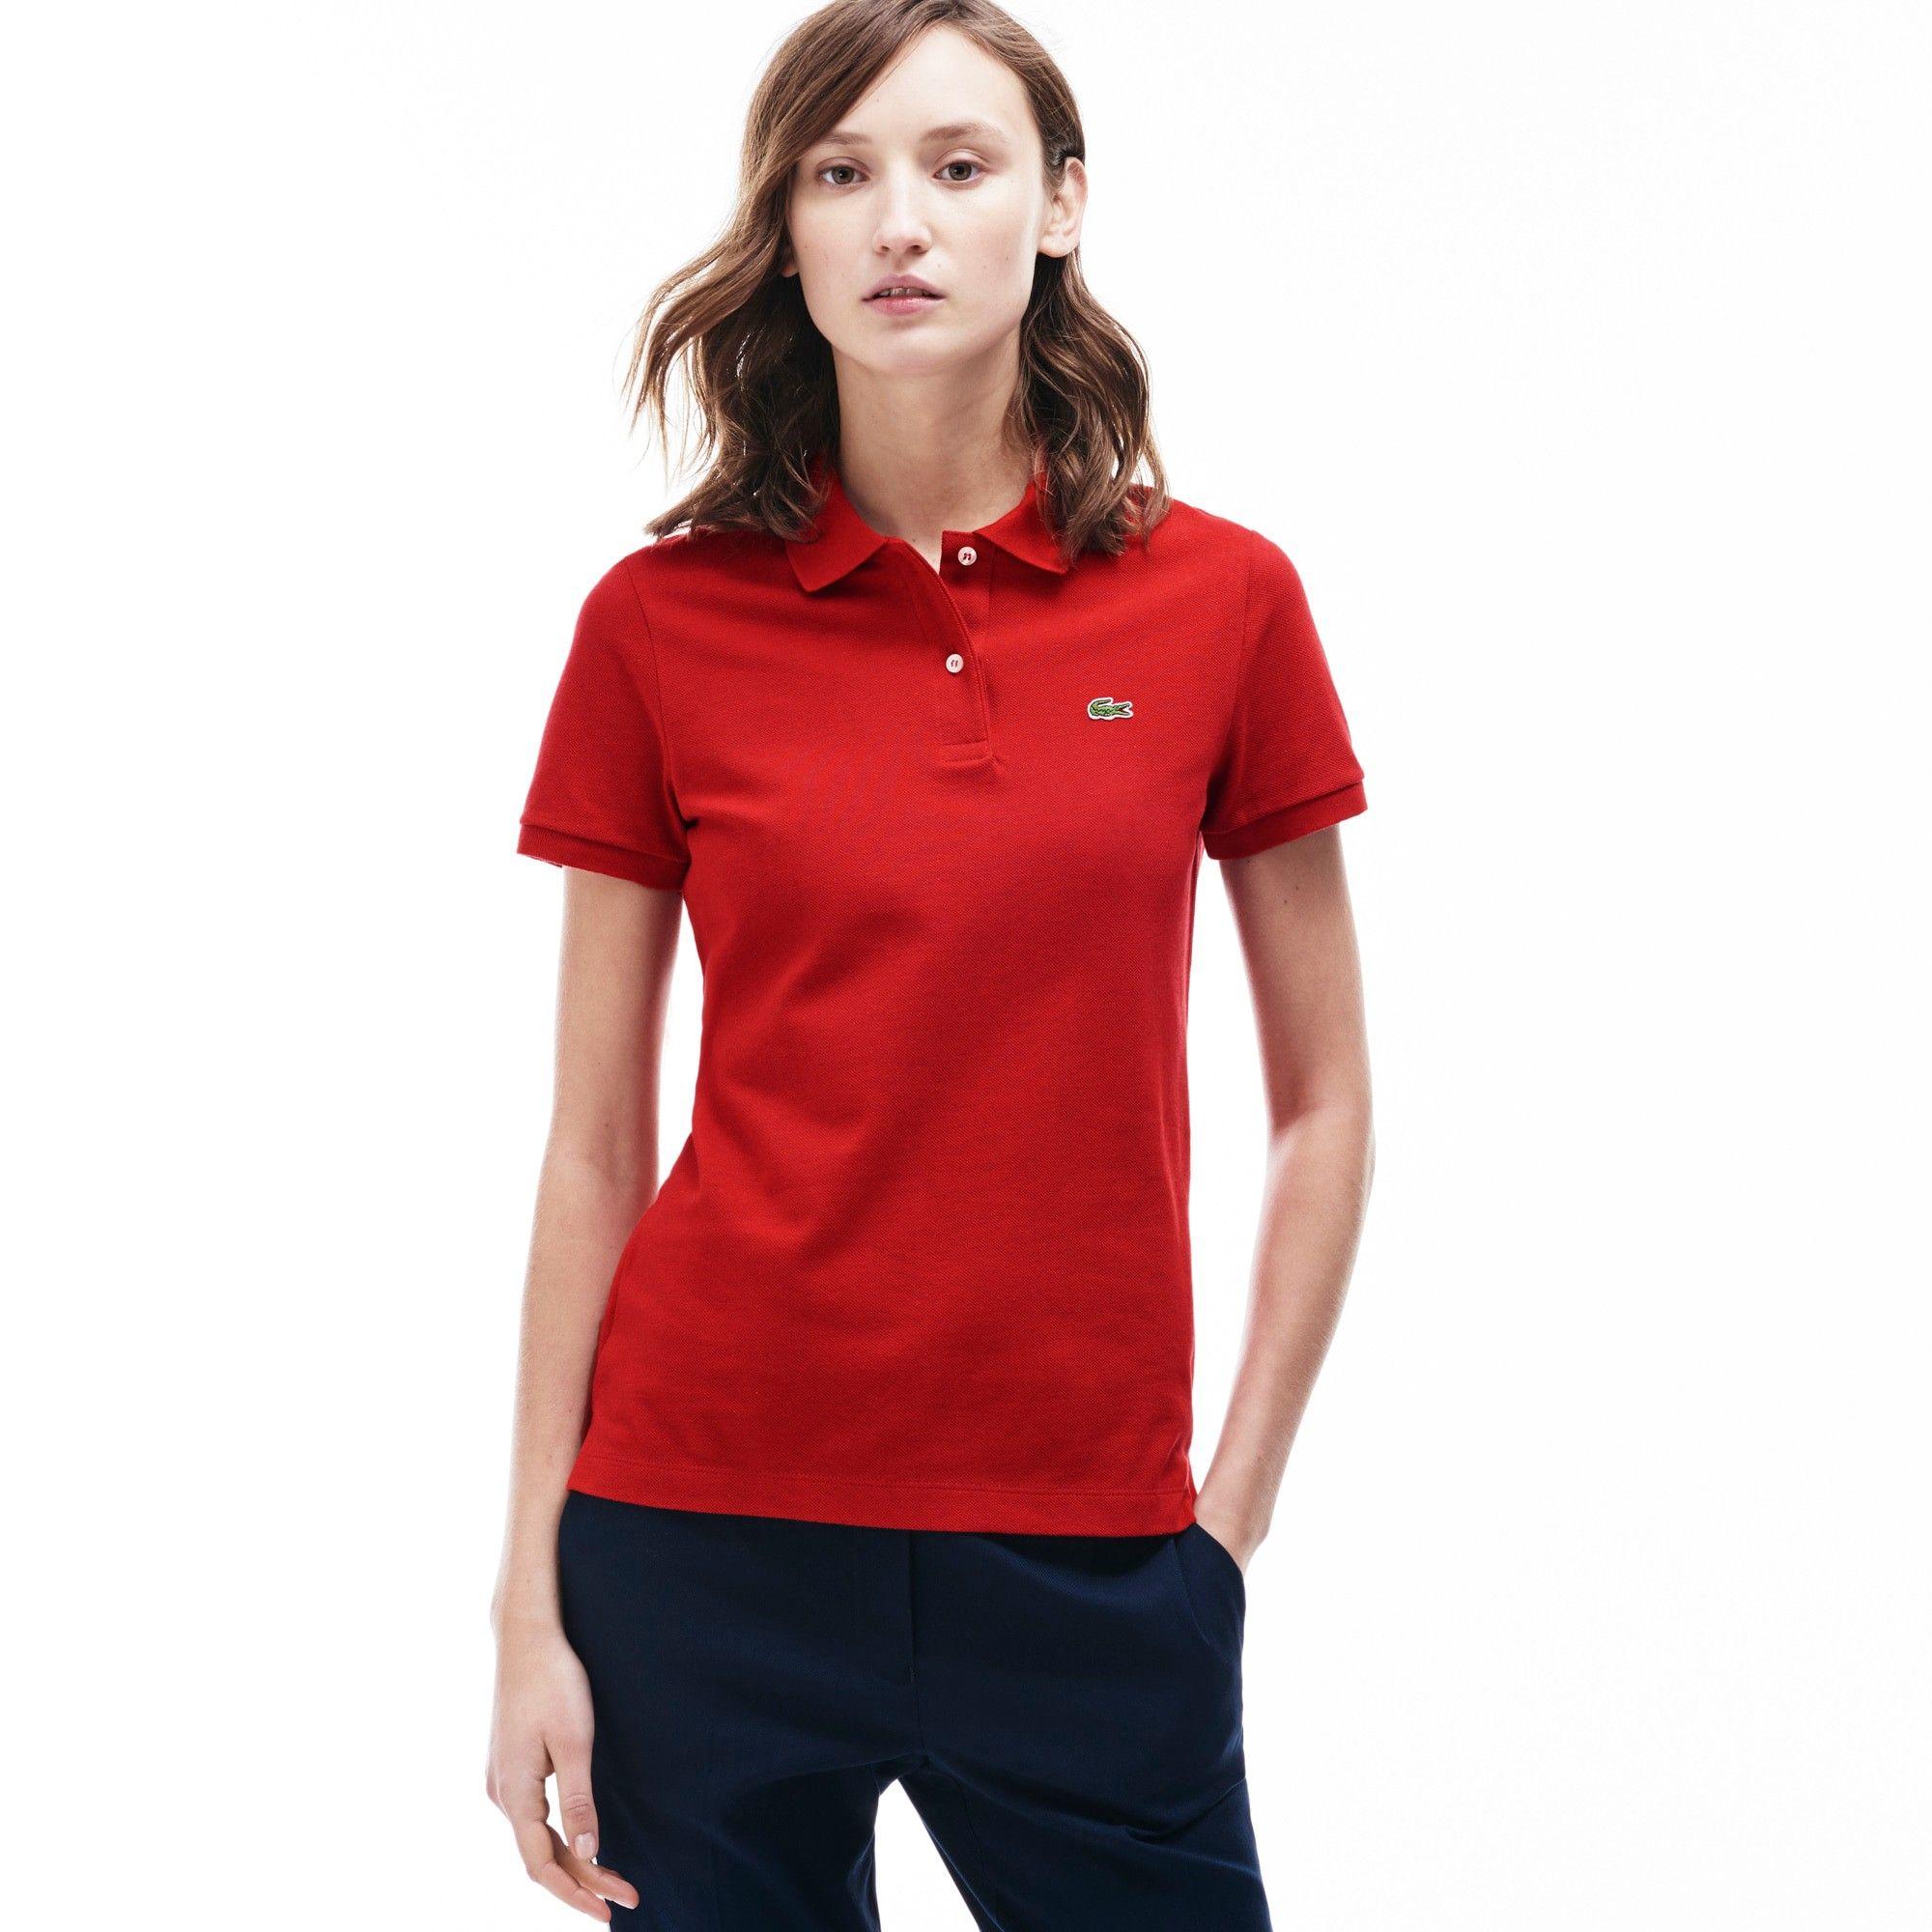 Lacoste Womens Classic Fit Piqu Polo Shirt Grenadine Chine